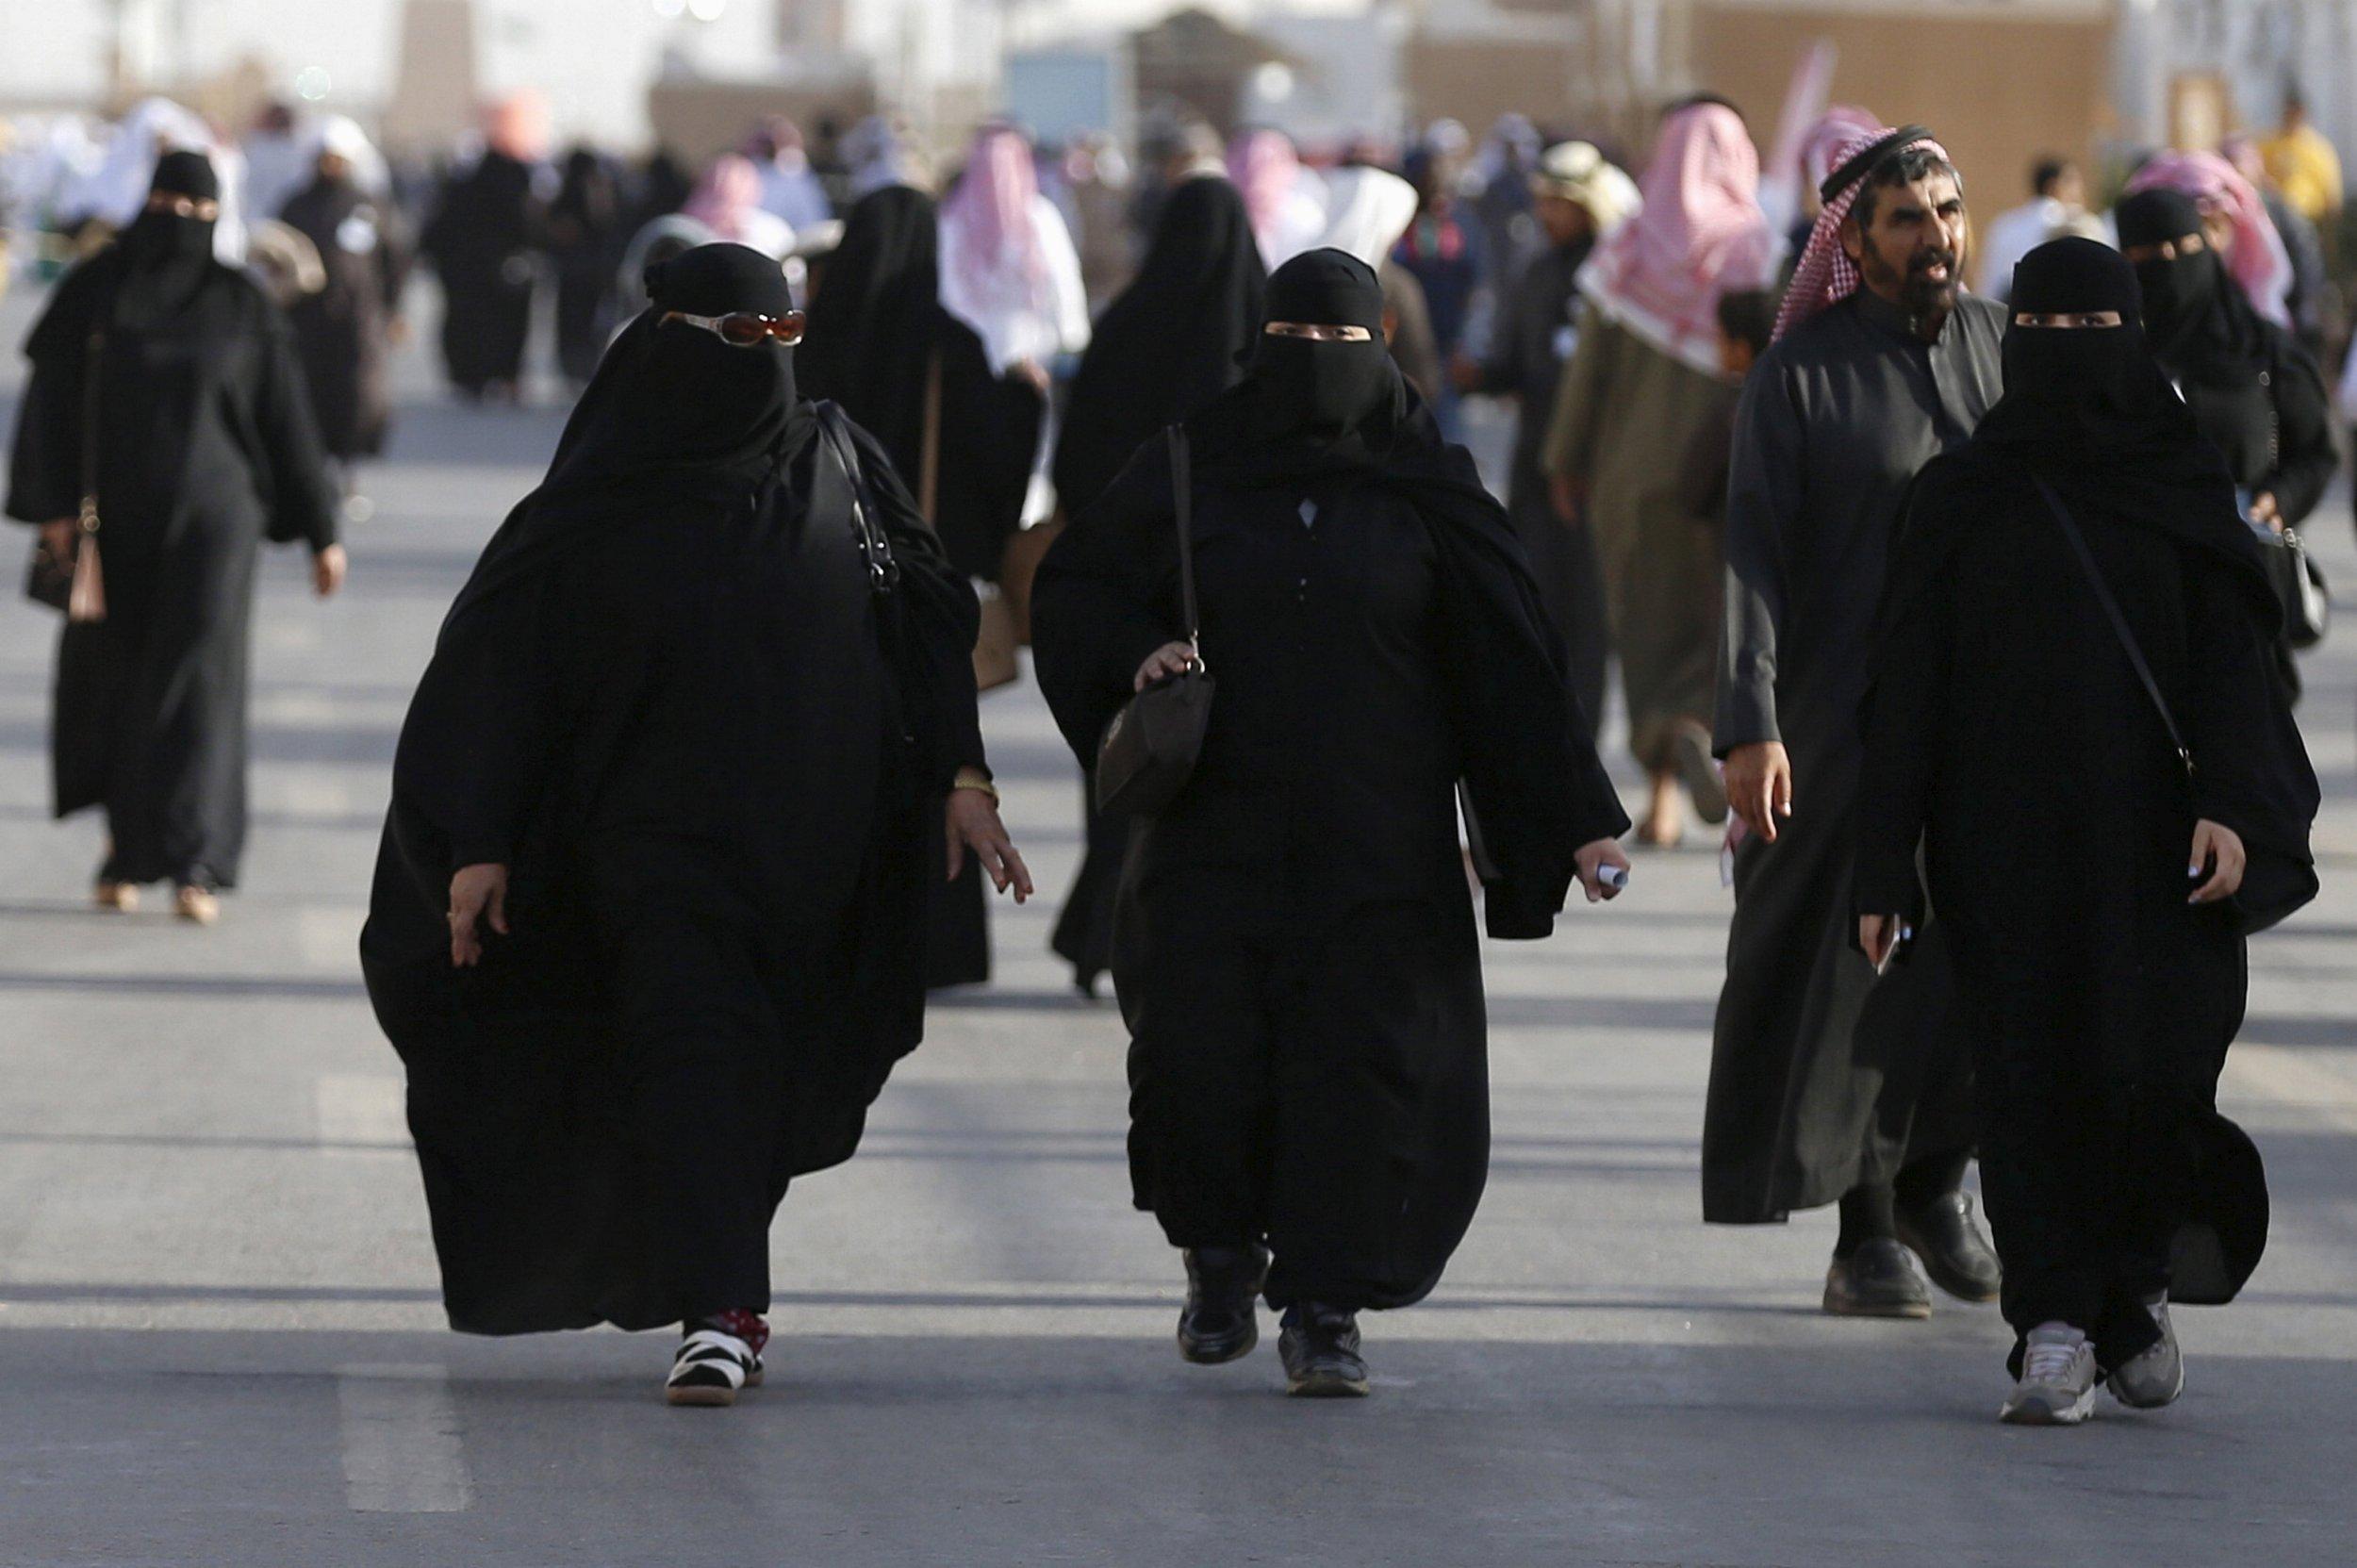 Saudi women attend a cultural festival near Riyadh.